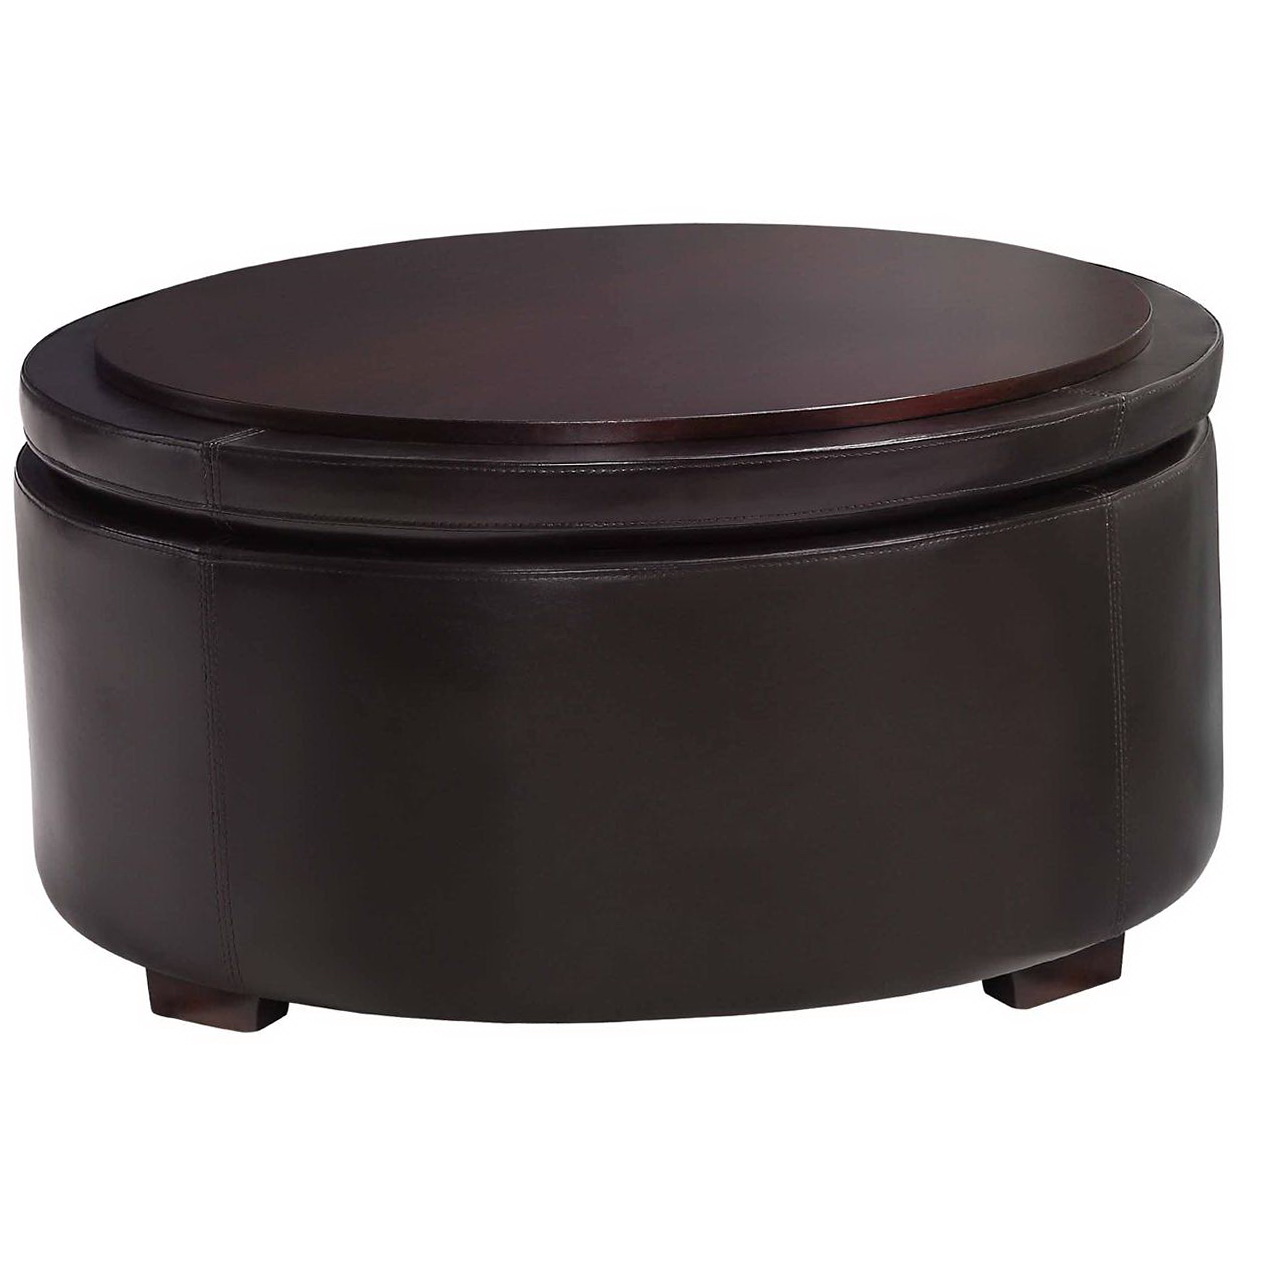 Large Round Storage Ottoman Coffee Table